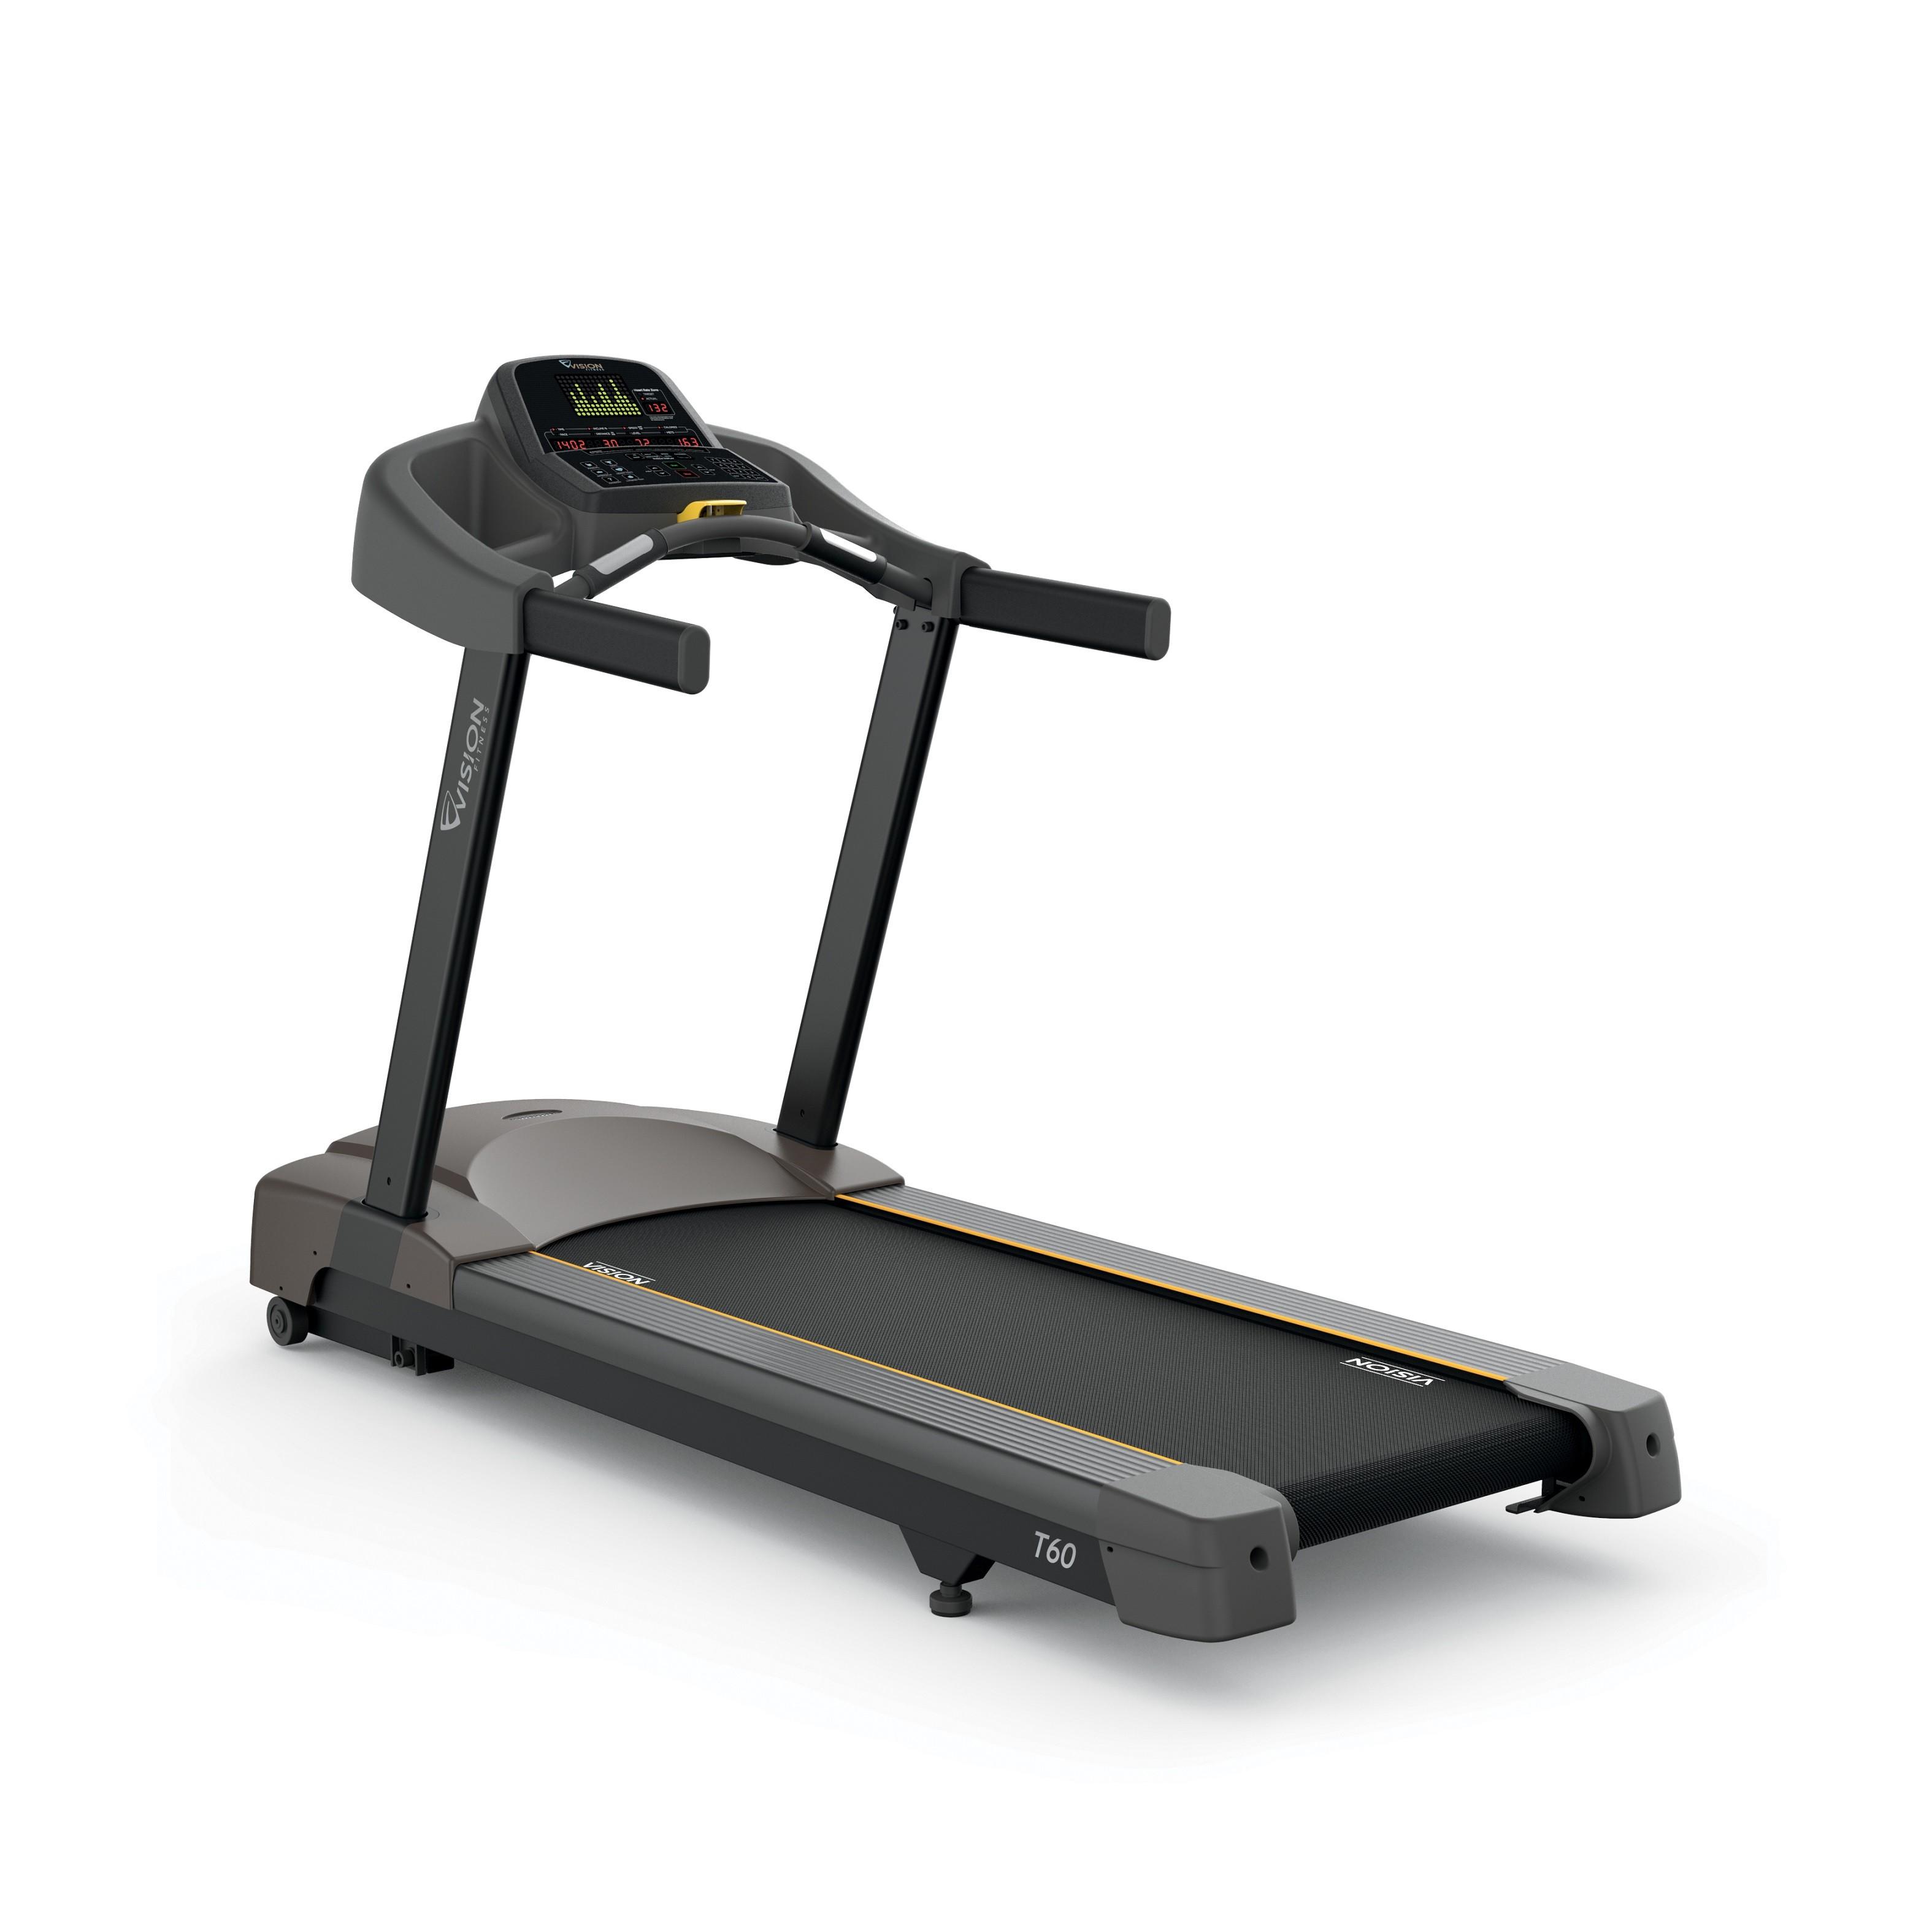 Life Fitness Treadmill Philippines: BODYWORX SPORT 1750 TREADMILL Melbourne